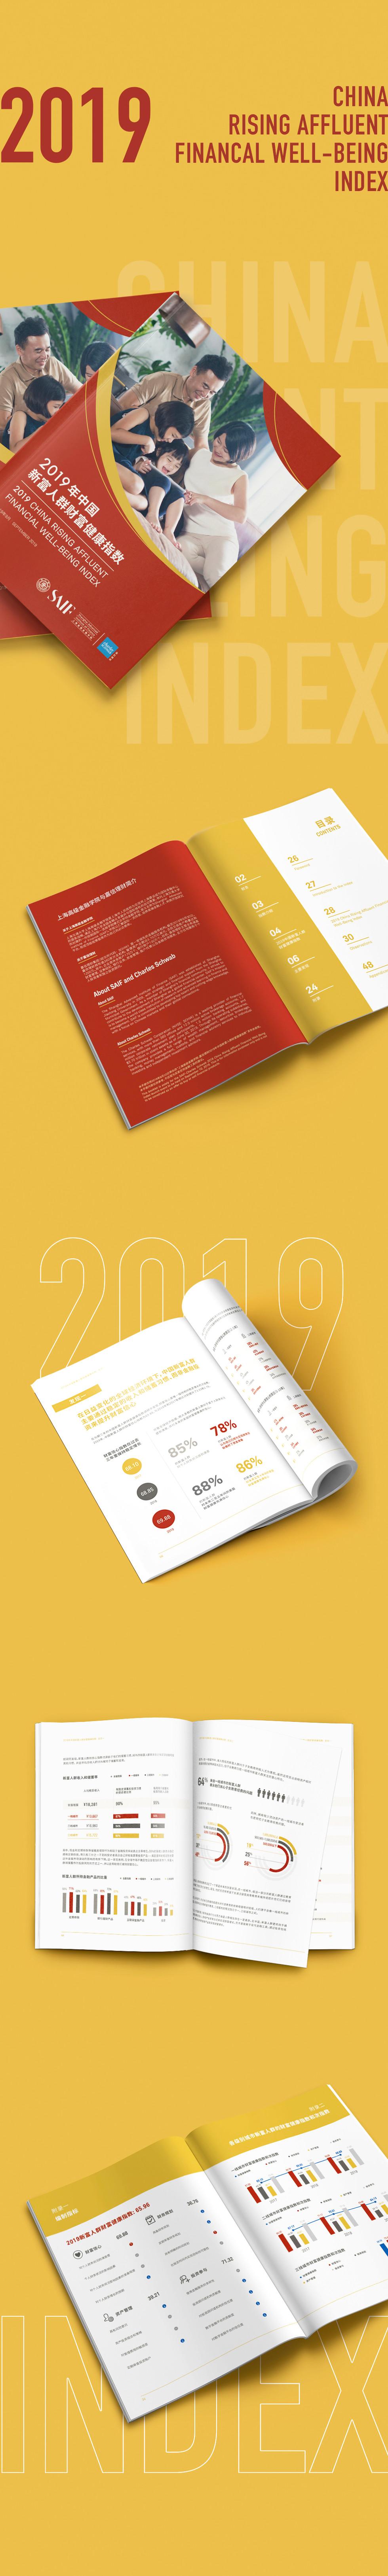 可视化报告-Rising Affulent Report-2019.jpg